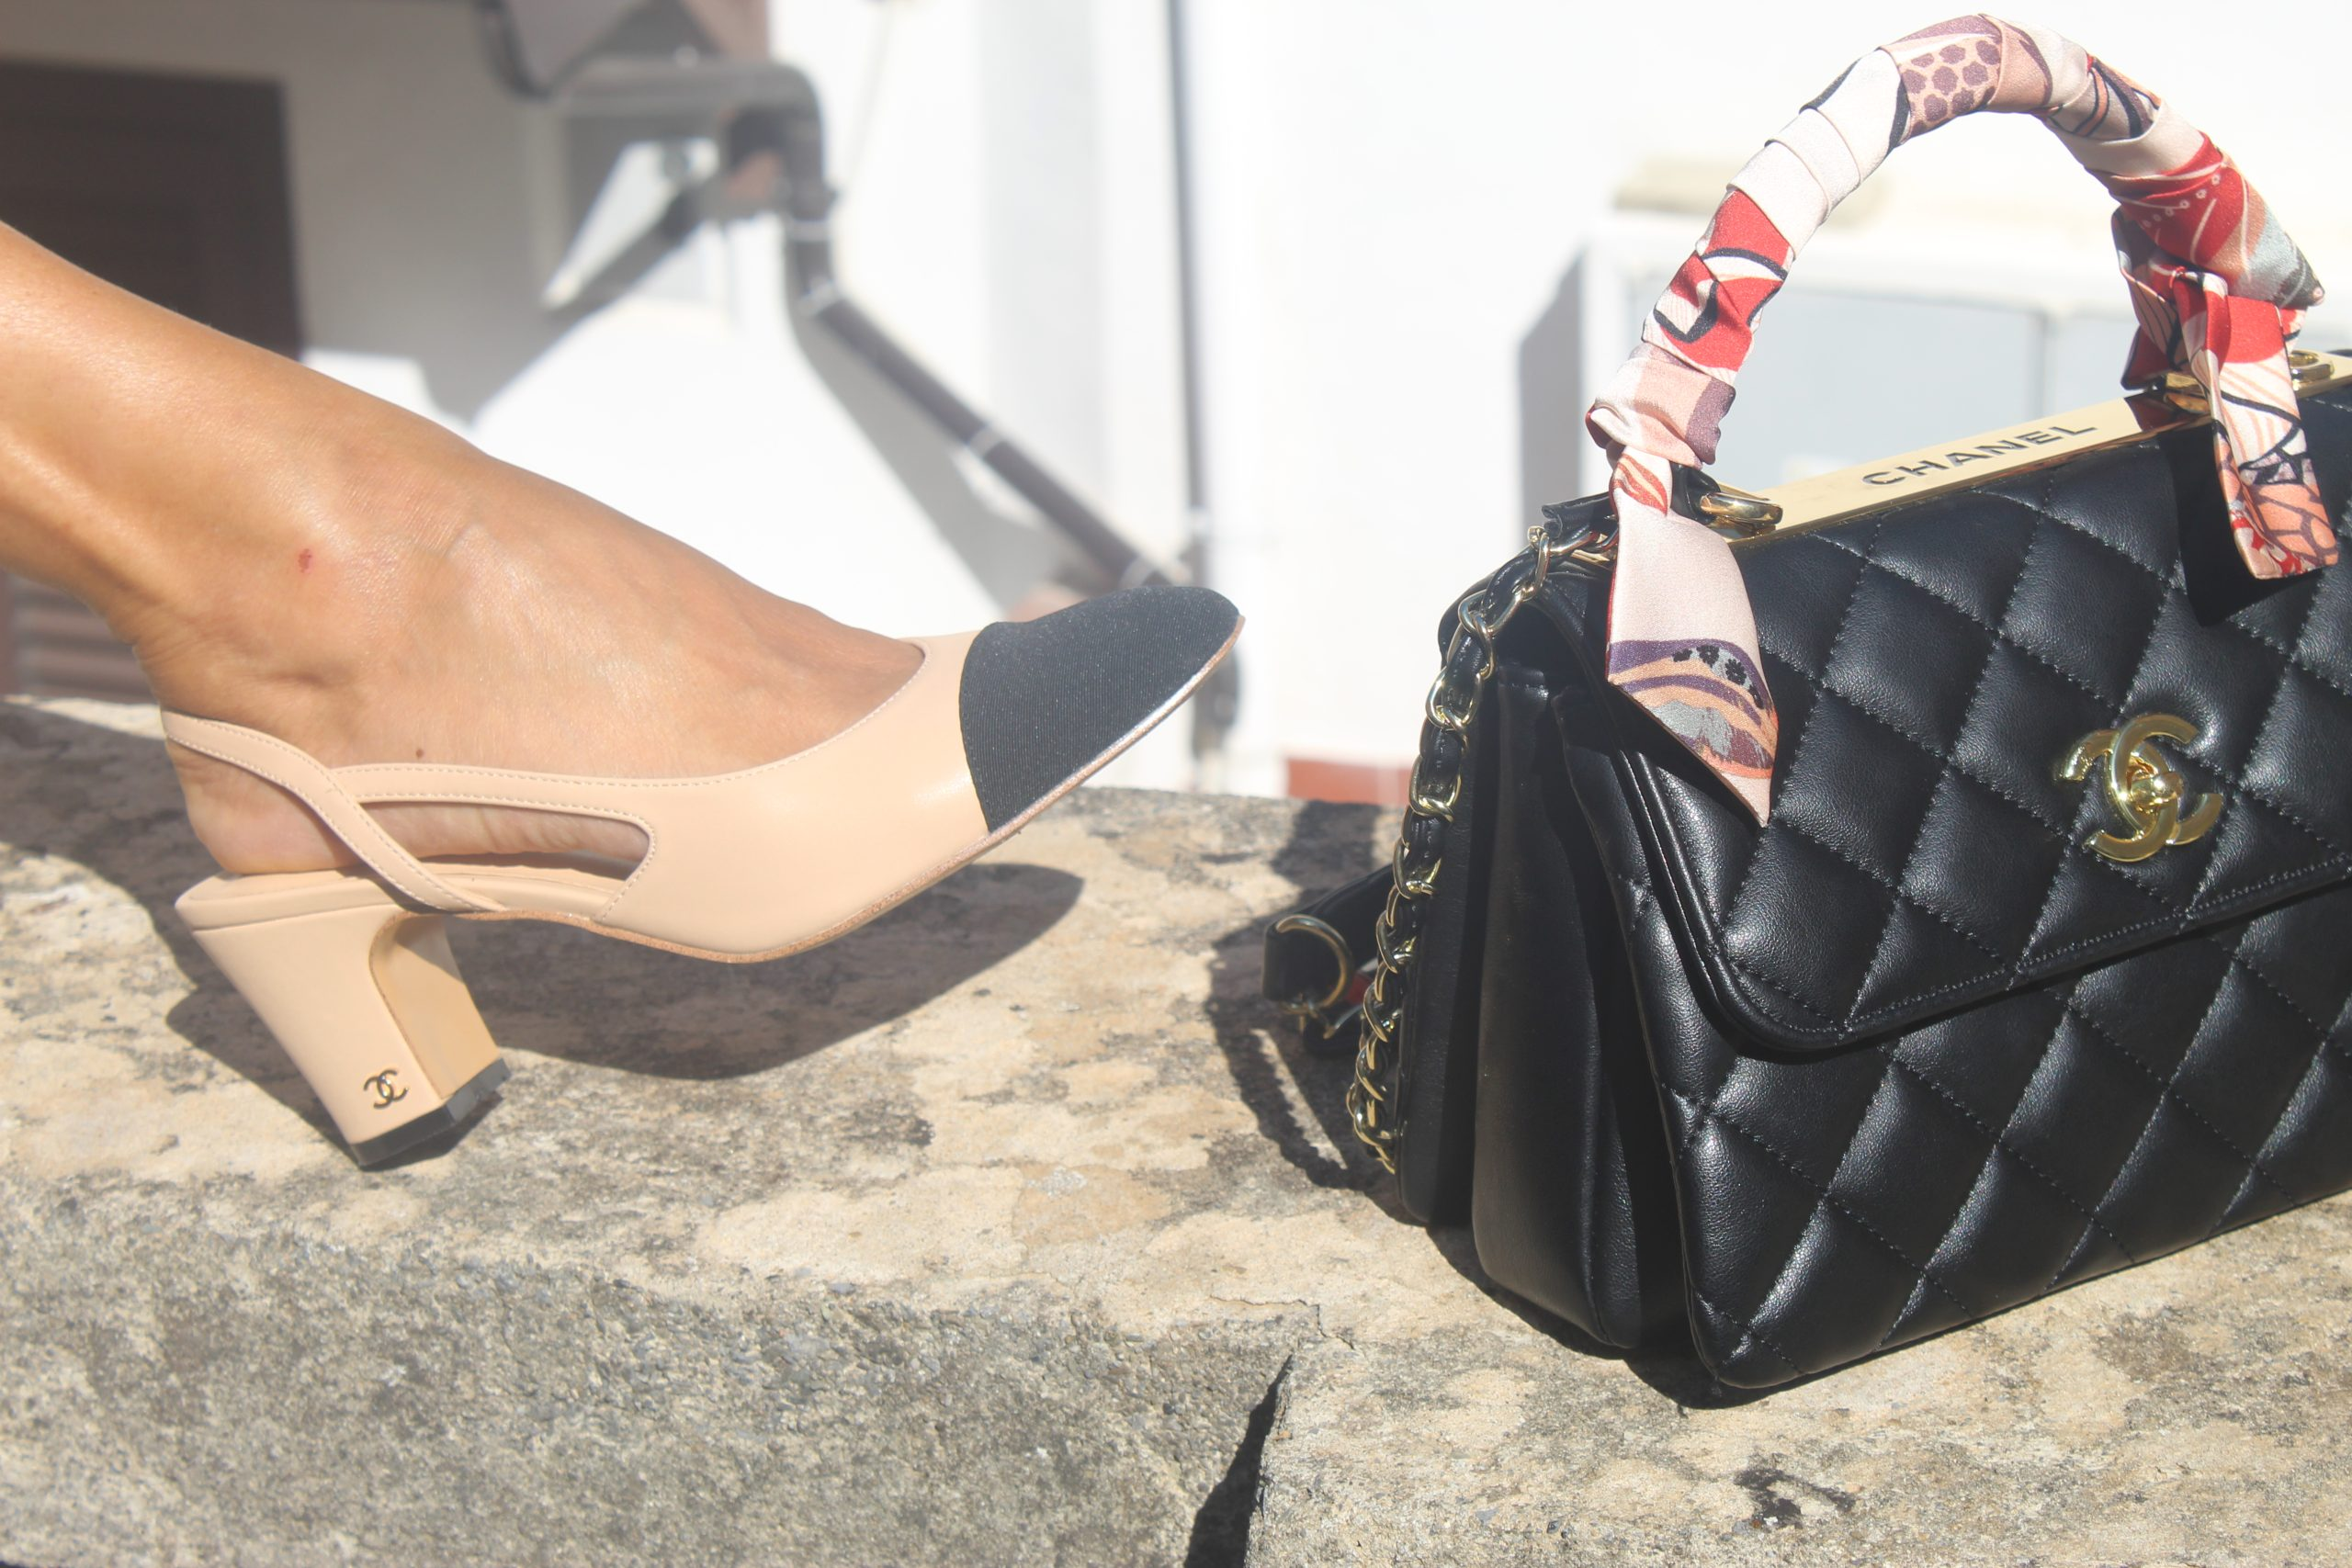 Fall 2021 trend floral jacket pjs style FEDERICA ERRE jacket RUBEN DELLA RICCIA MILANO shorts  CHANEL accessories Travel in Italy Paola Lauretano